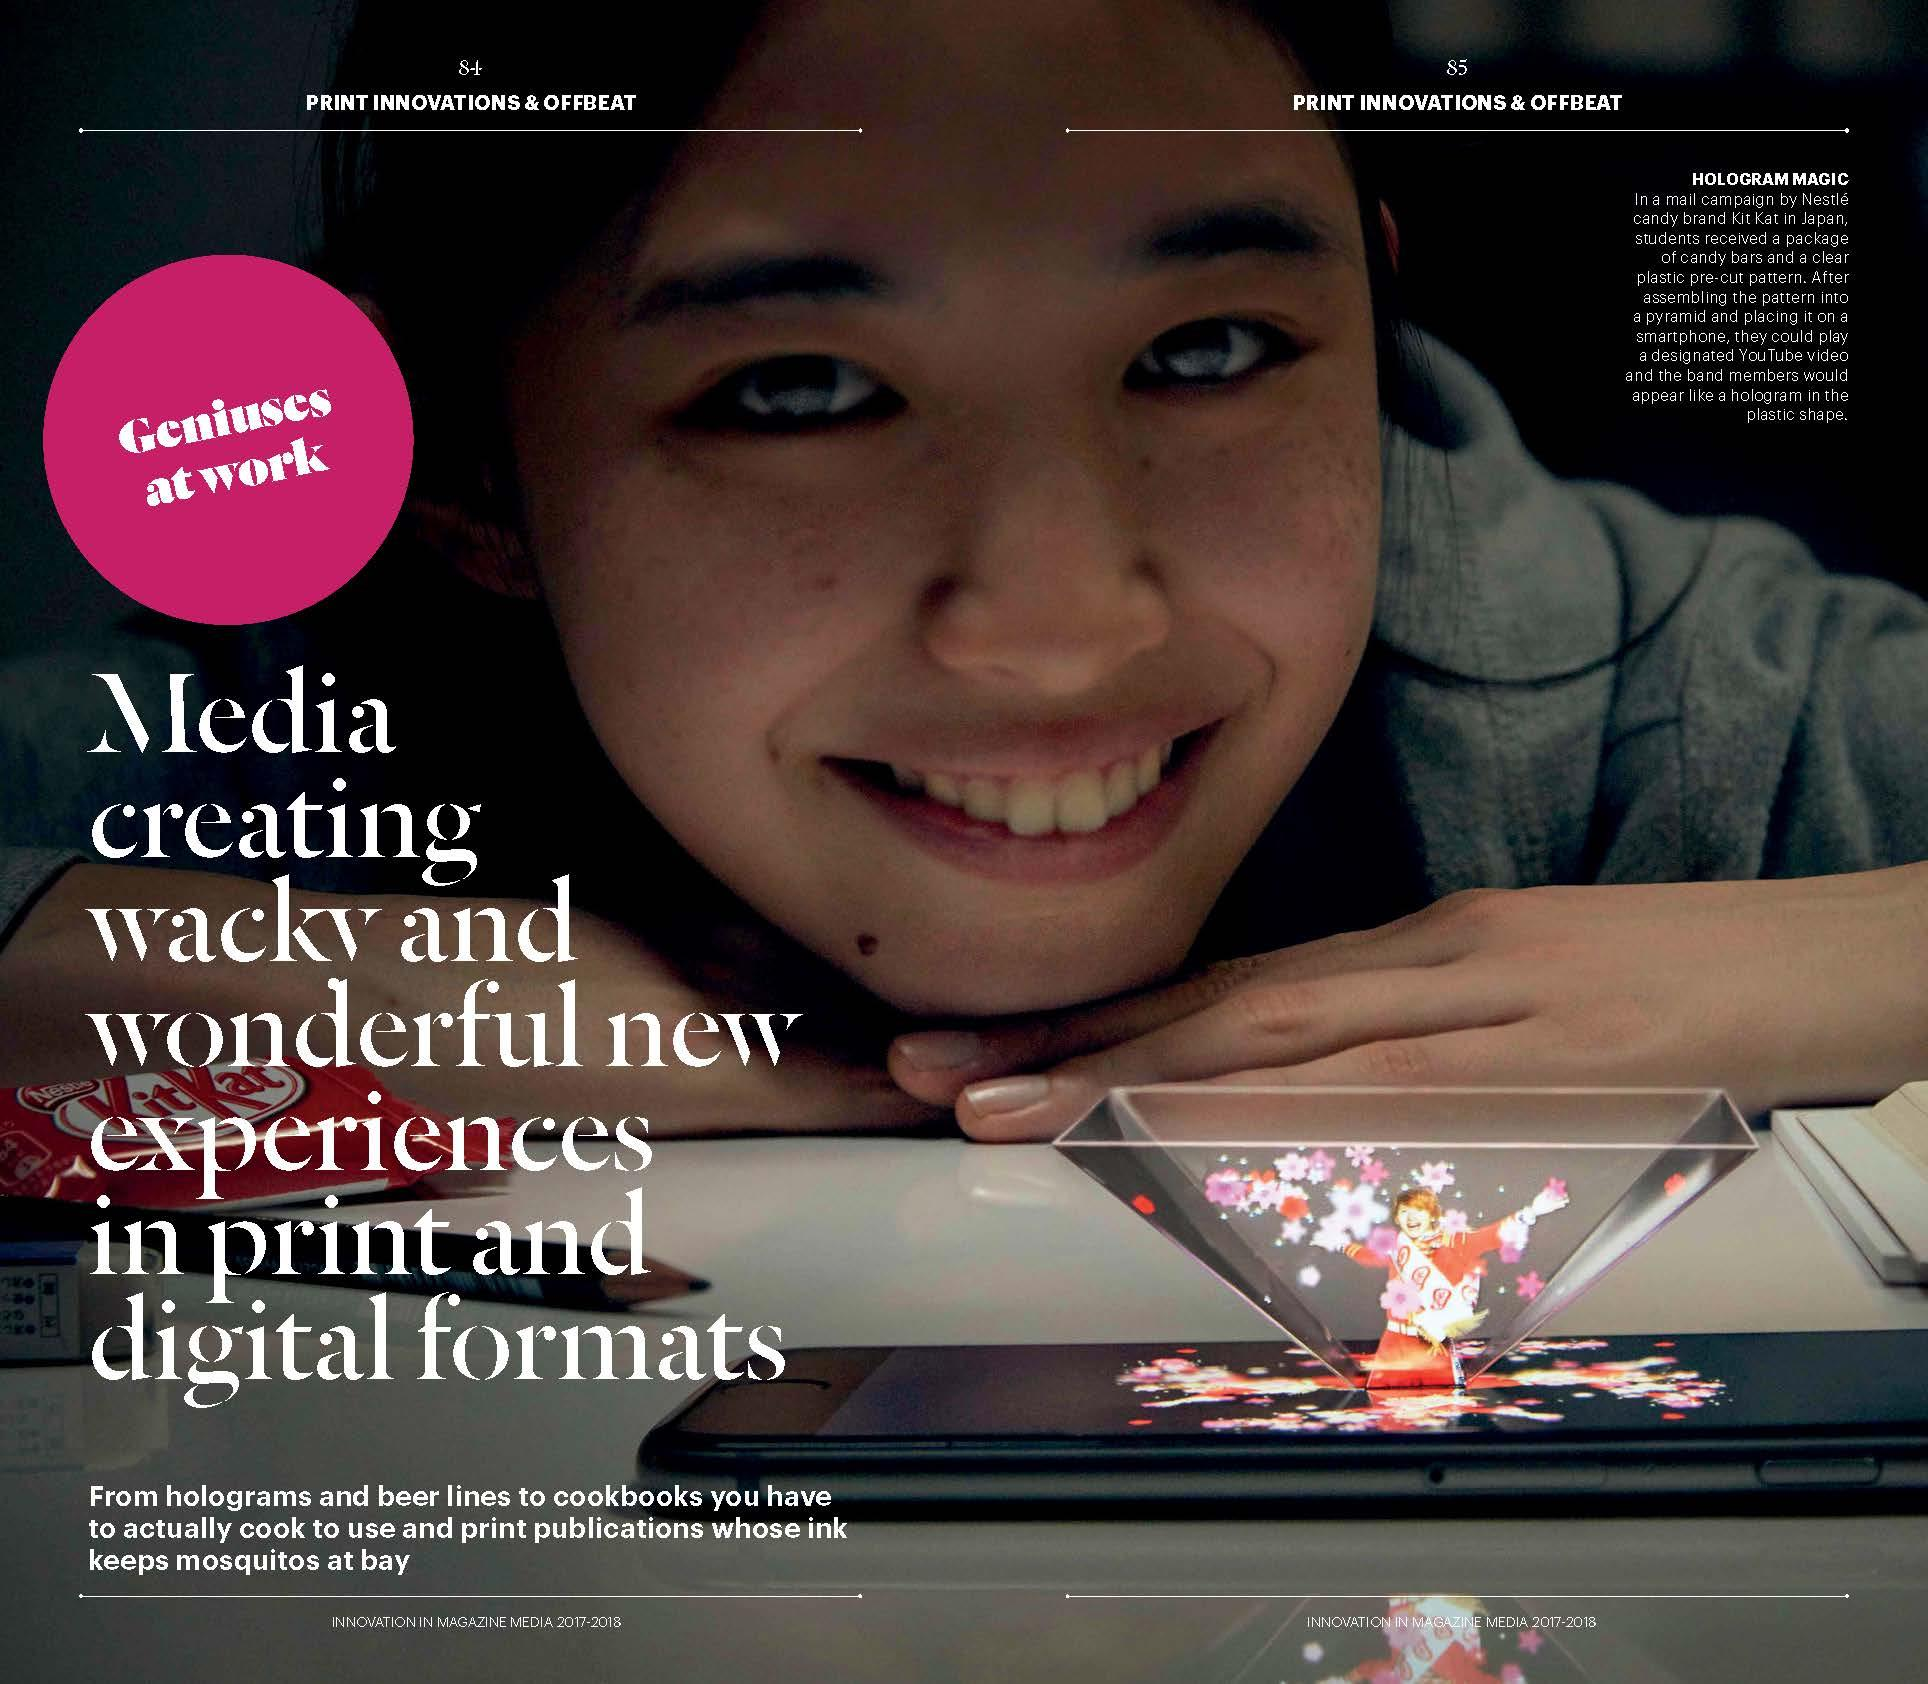 Offbeat - Innovation in Magazine Media 2017-2018 World Report (FIPP)